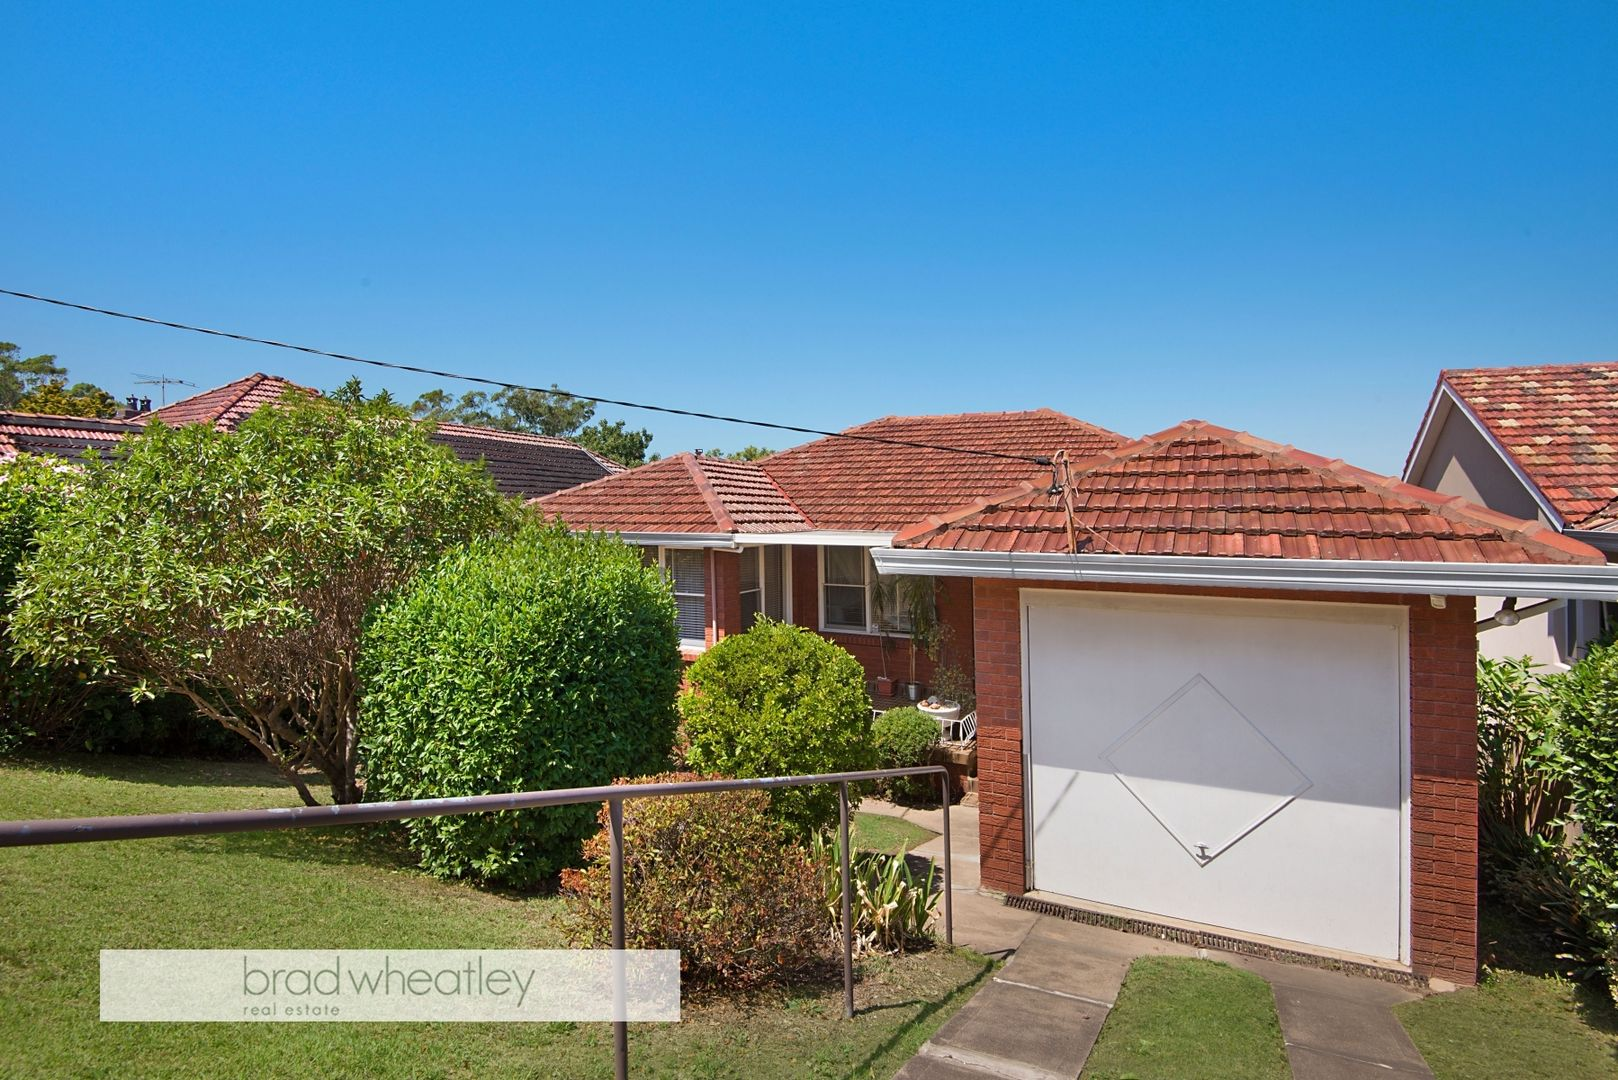 314 Blaxland Road, Ryde NSW 2112, Image 0